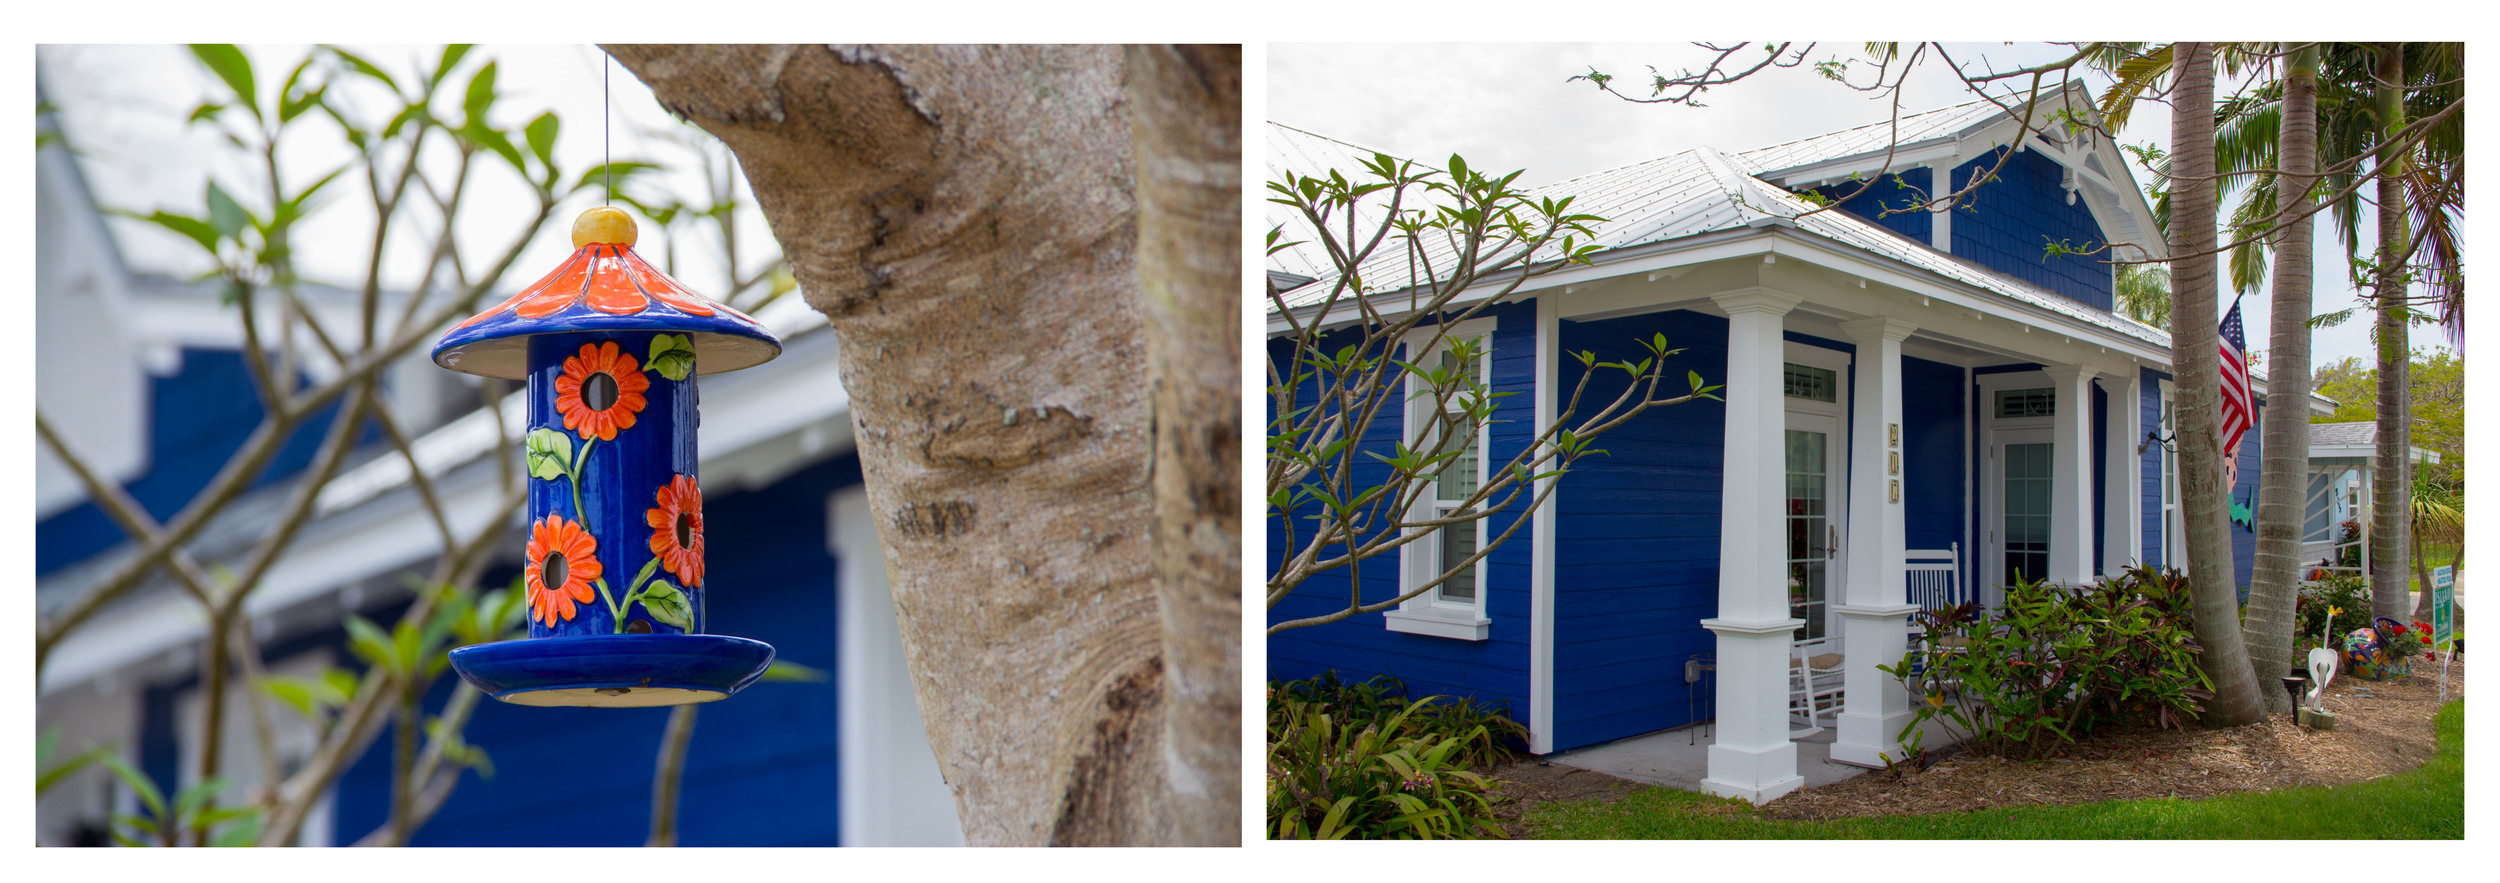 1_BLUE_HOUSE.jpg